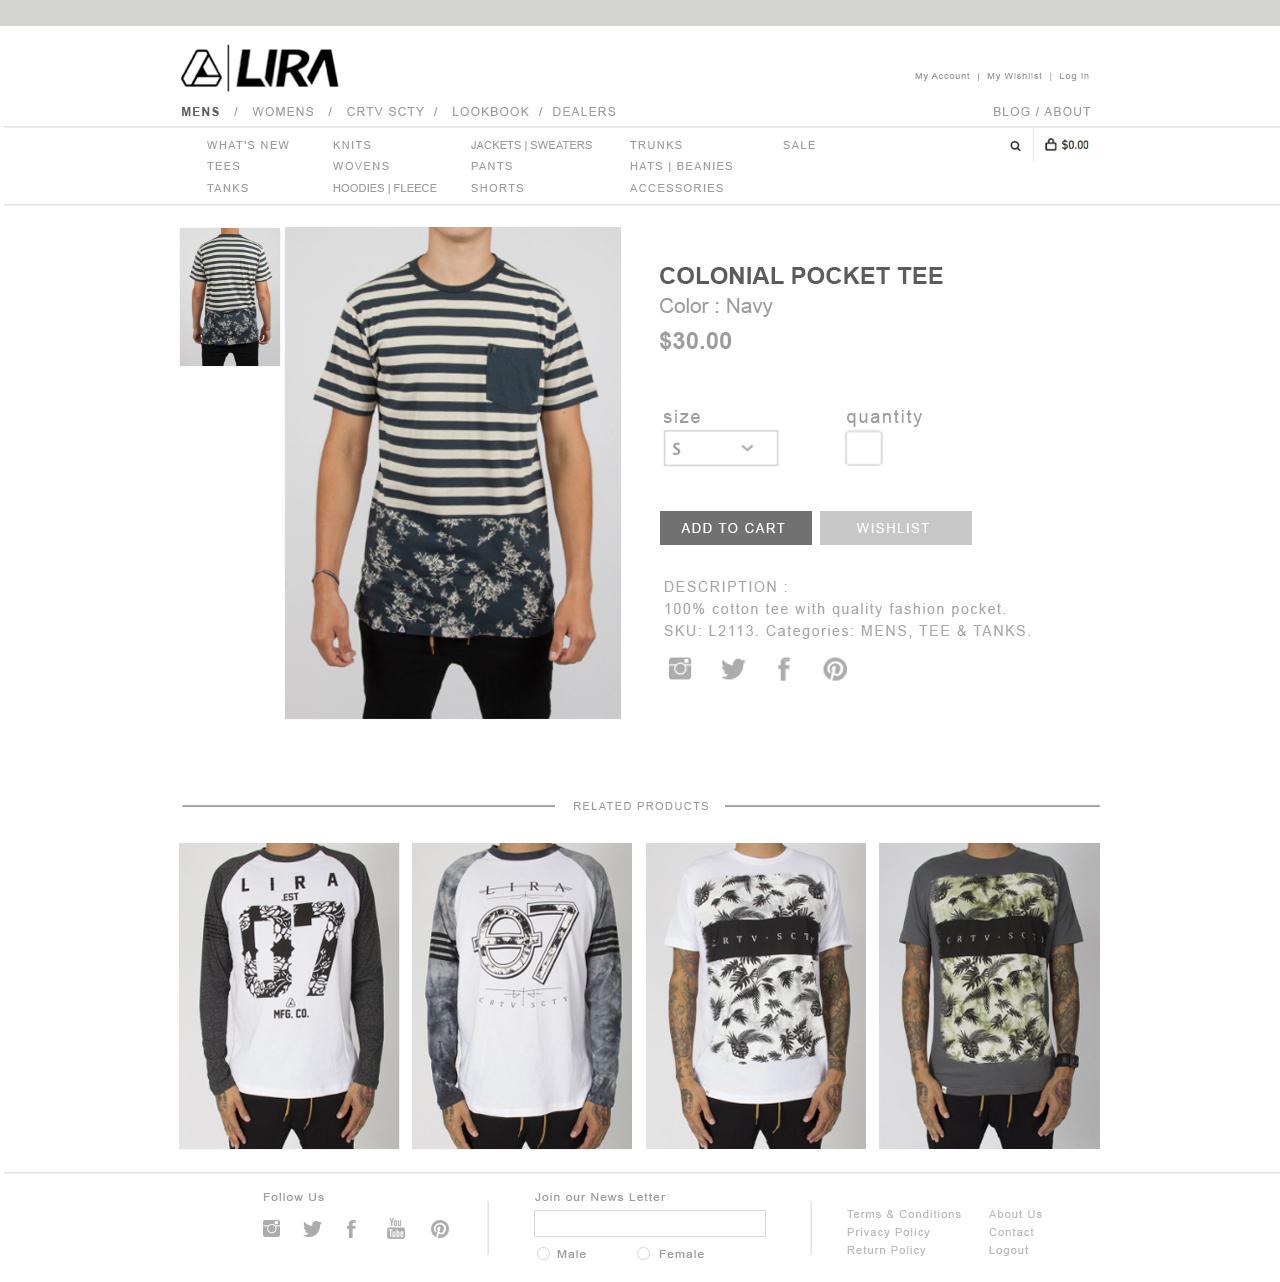 LIRA_MENS PRODUCT_BUY_PAGE.jpg